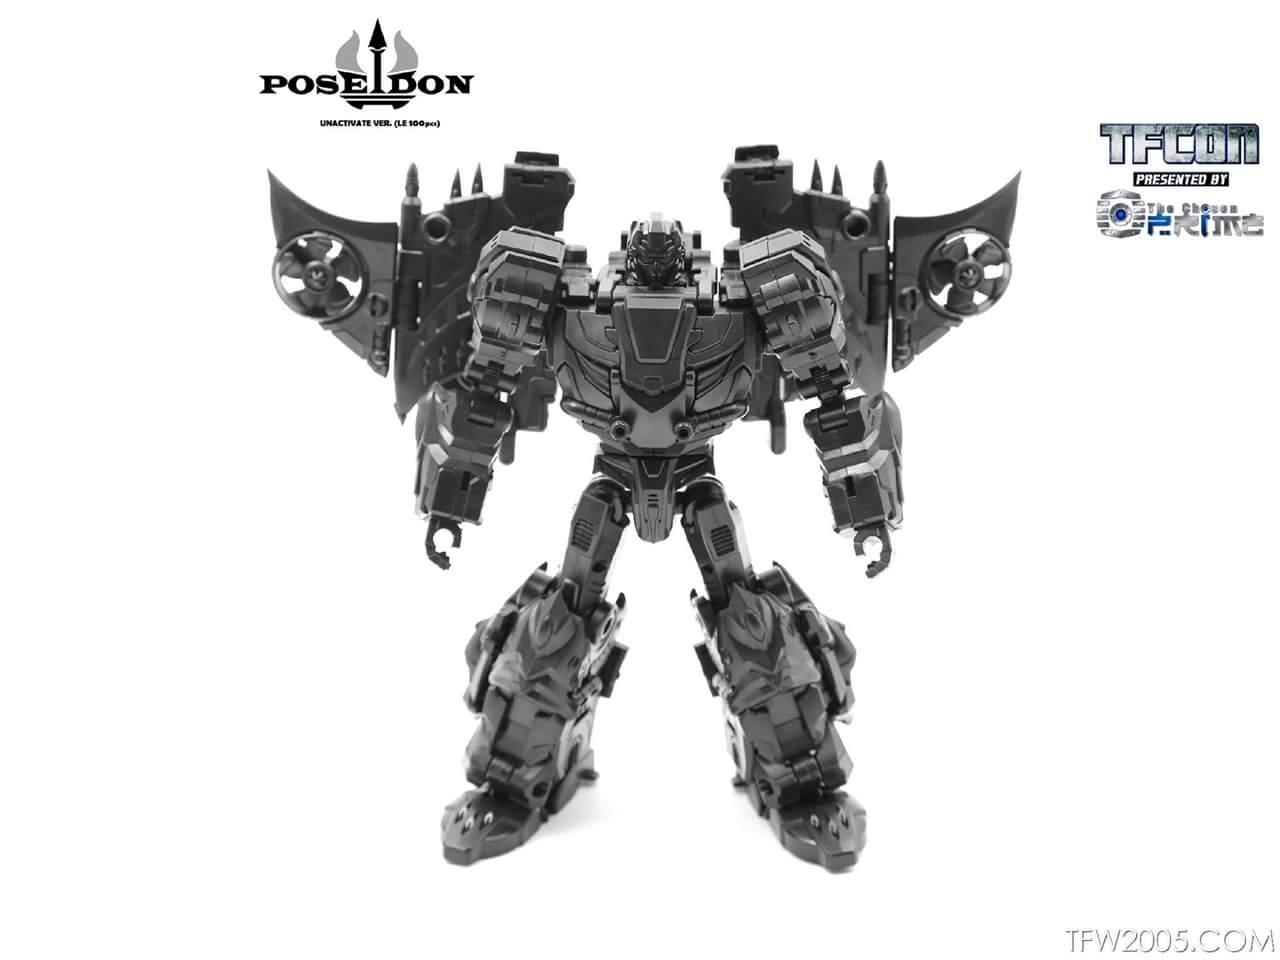 [TFC Toys] Produit Tiers - Jouet Poseidon - aka Piranacon/King Poseidon (TF Masterforce) - Page 6 DkSkUUb7_o